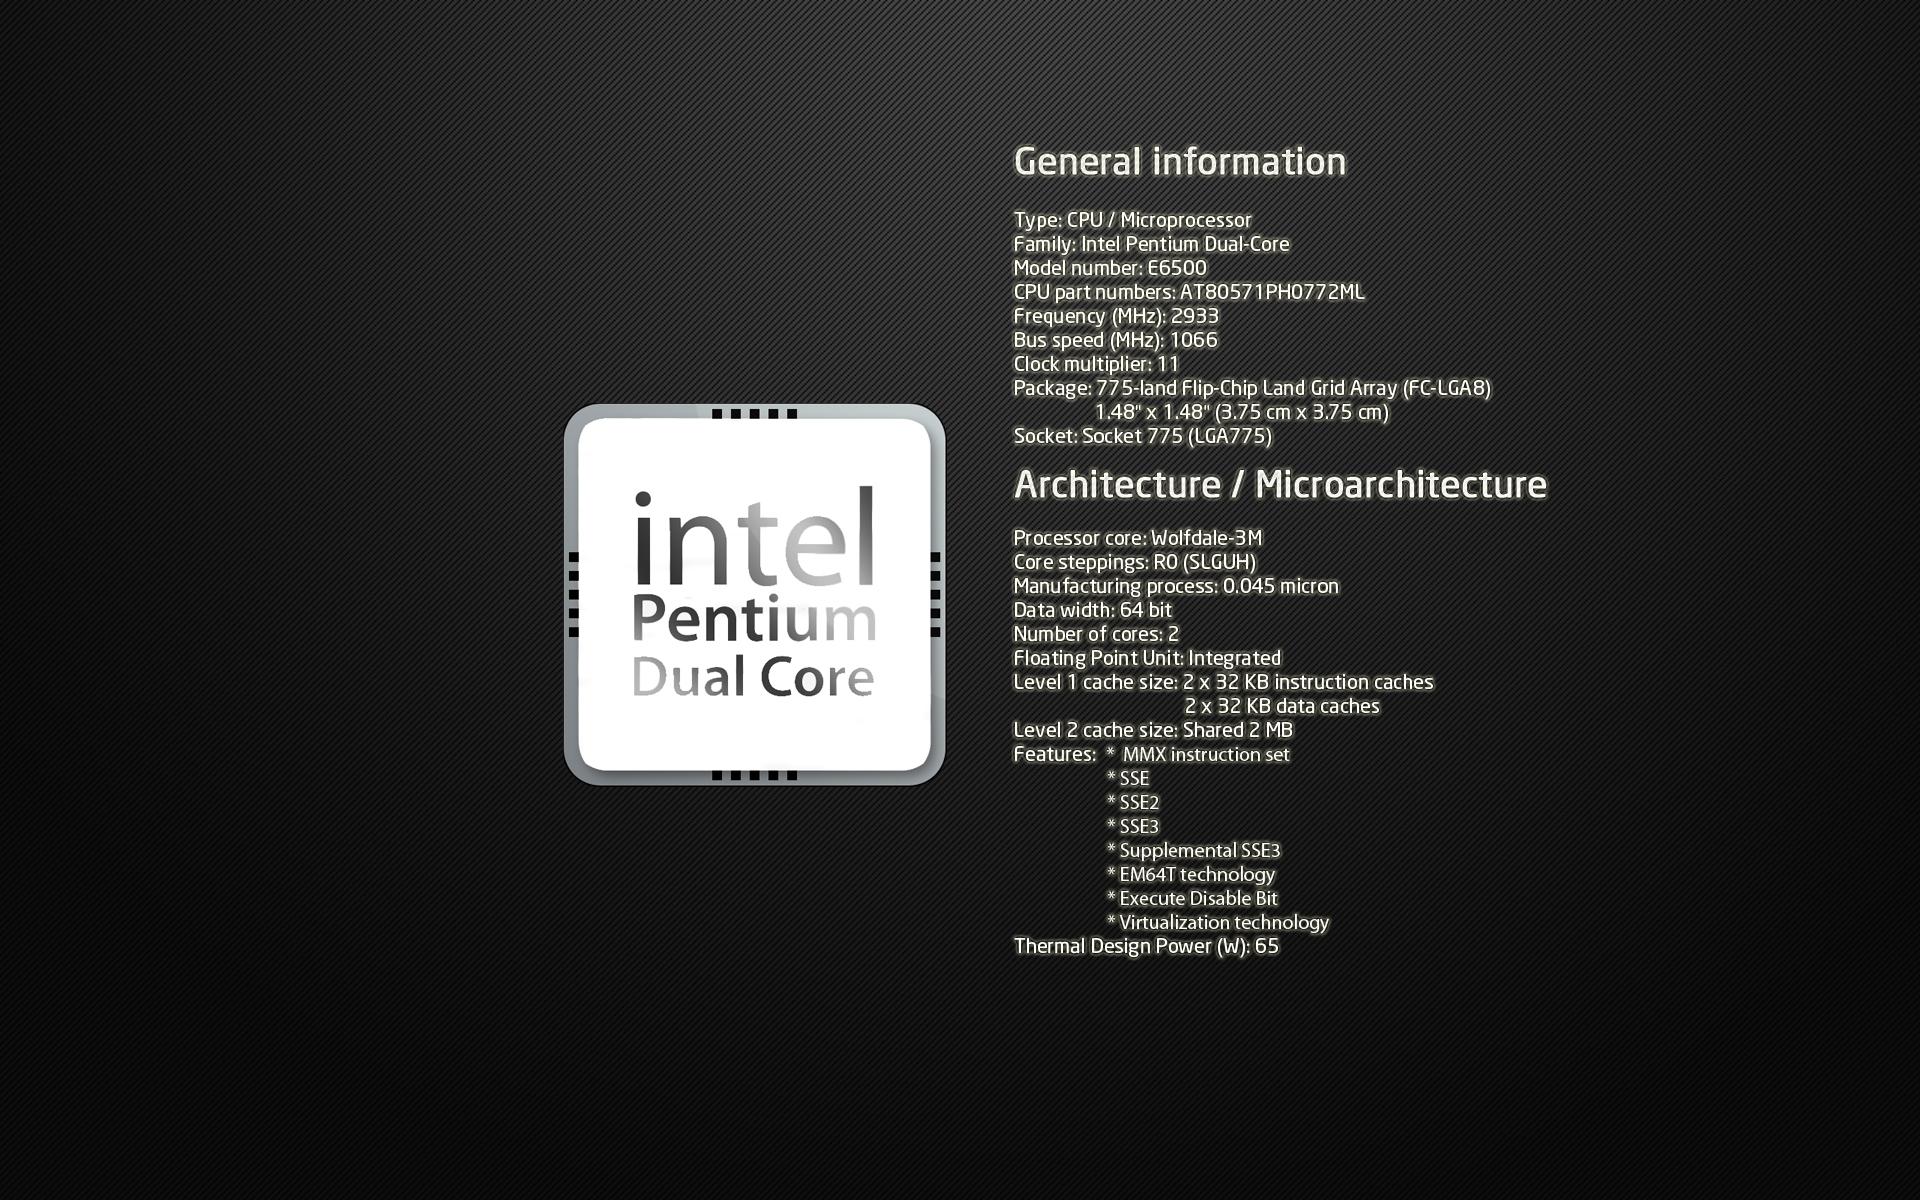 Best 47 Intel Pentium Wallpaper on HipWallpaper Business Intel 1920x1200